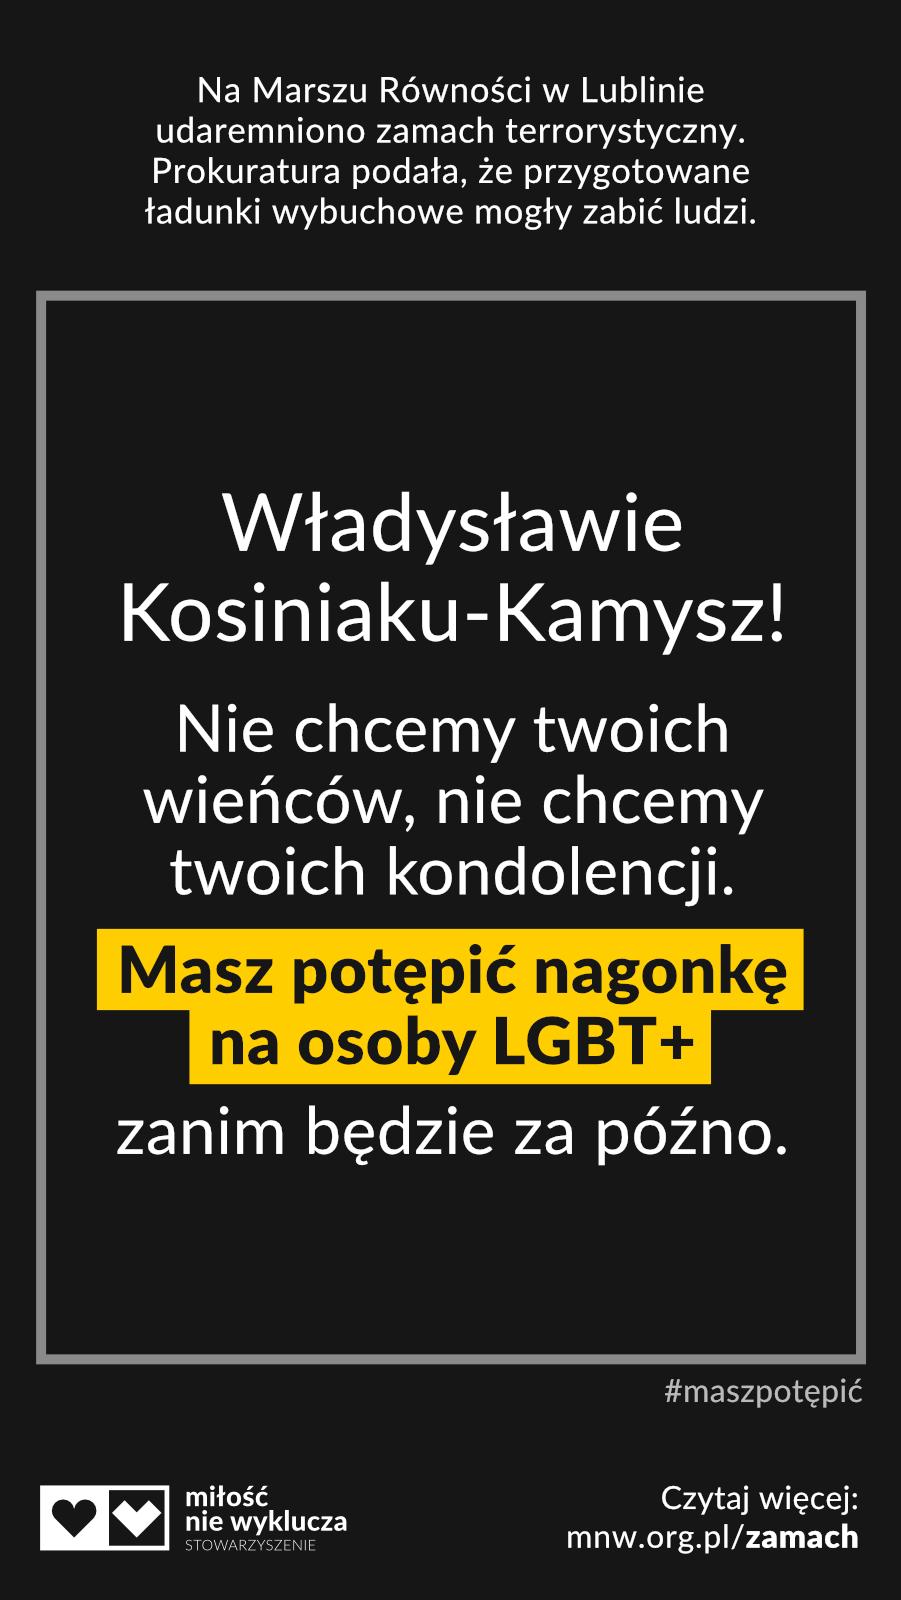 Kosiniak-Kamysz #maszpotepic zamach LGBT+